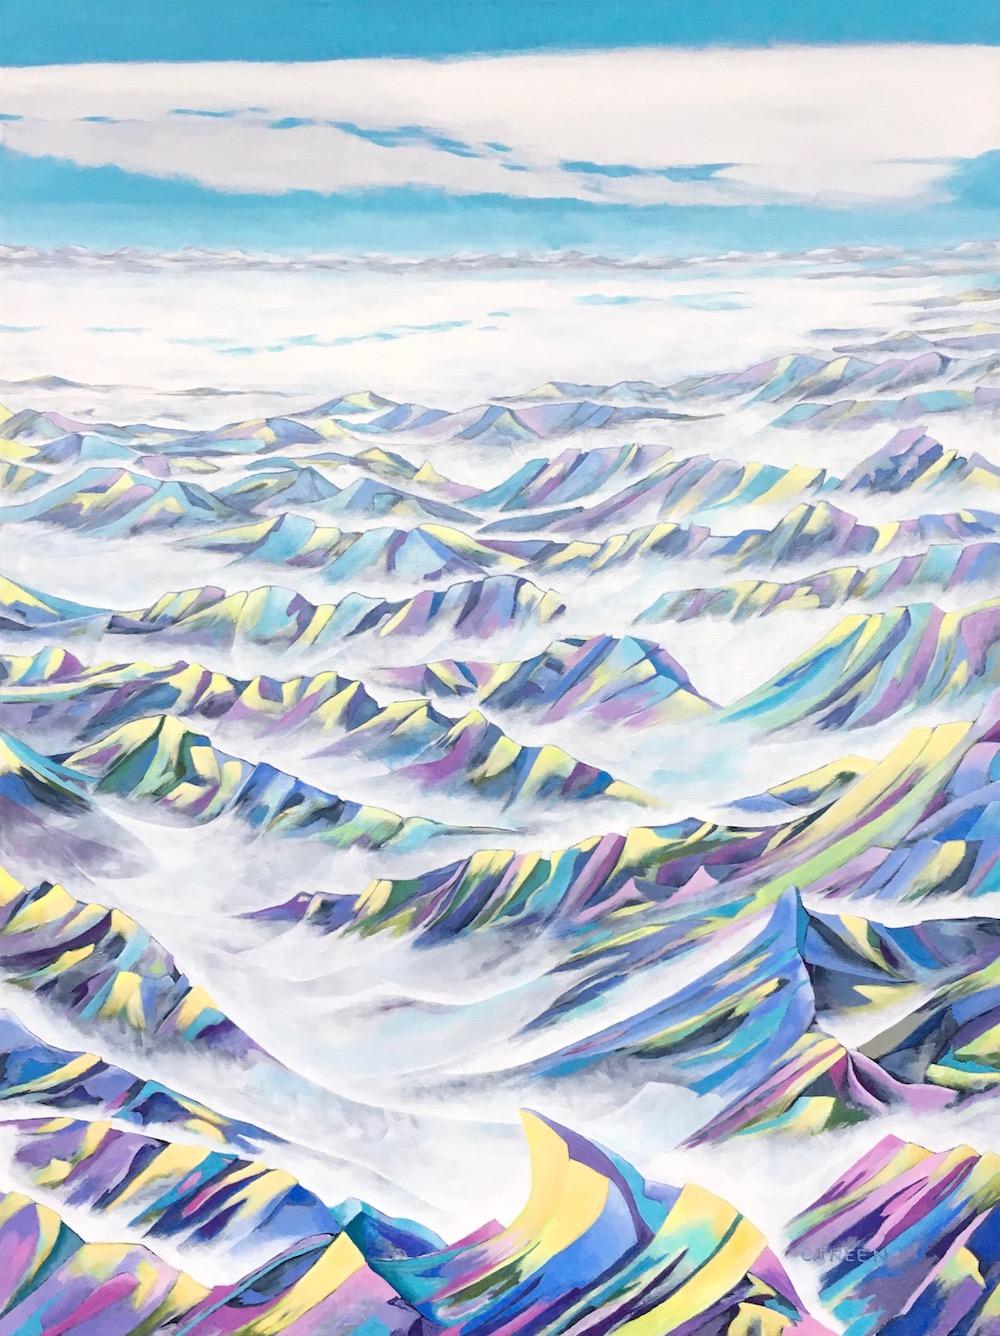 The Alps - Primordial